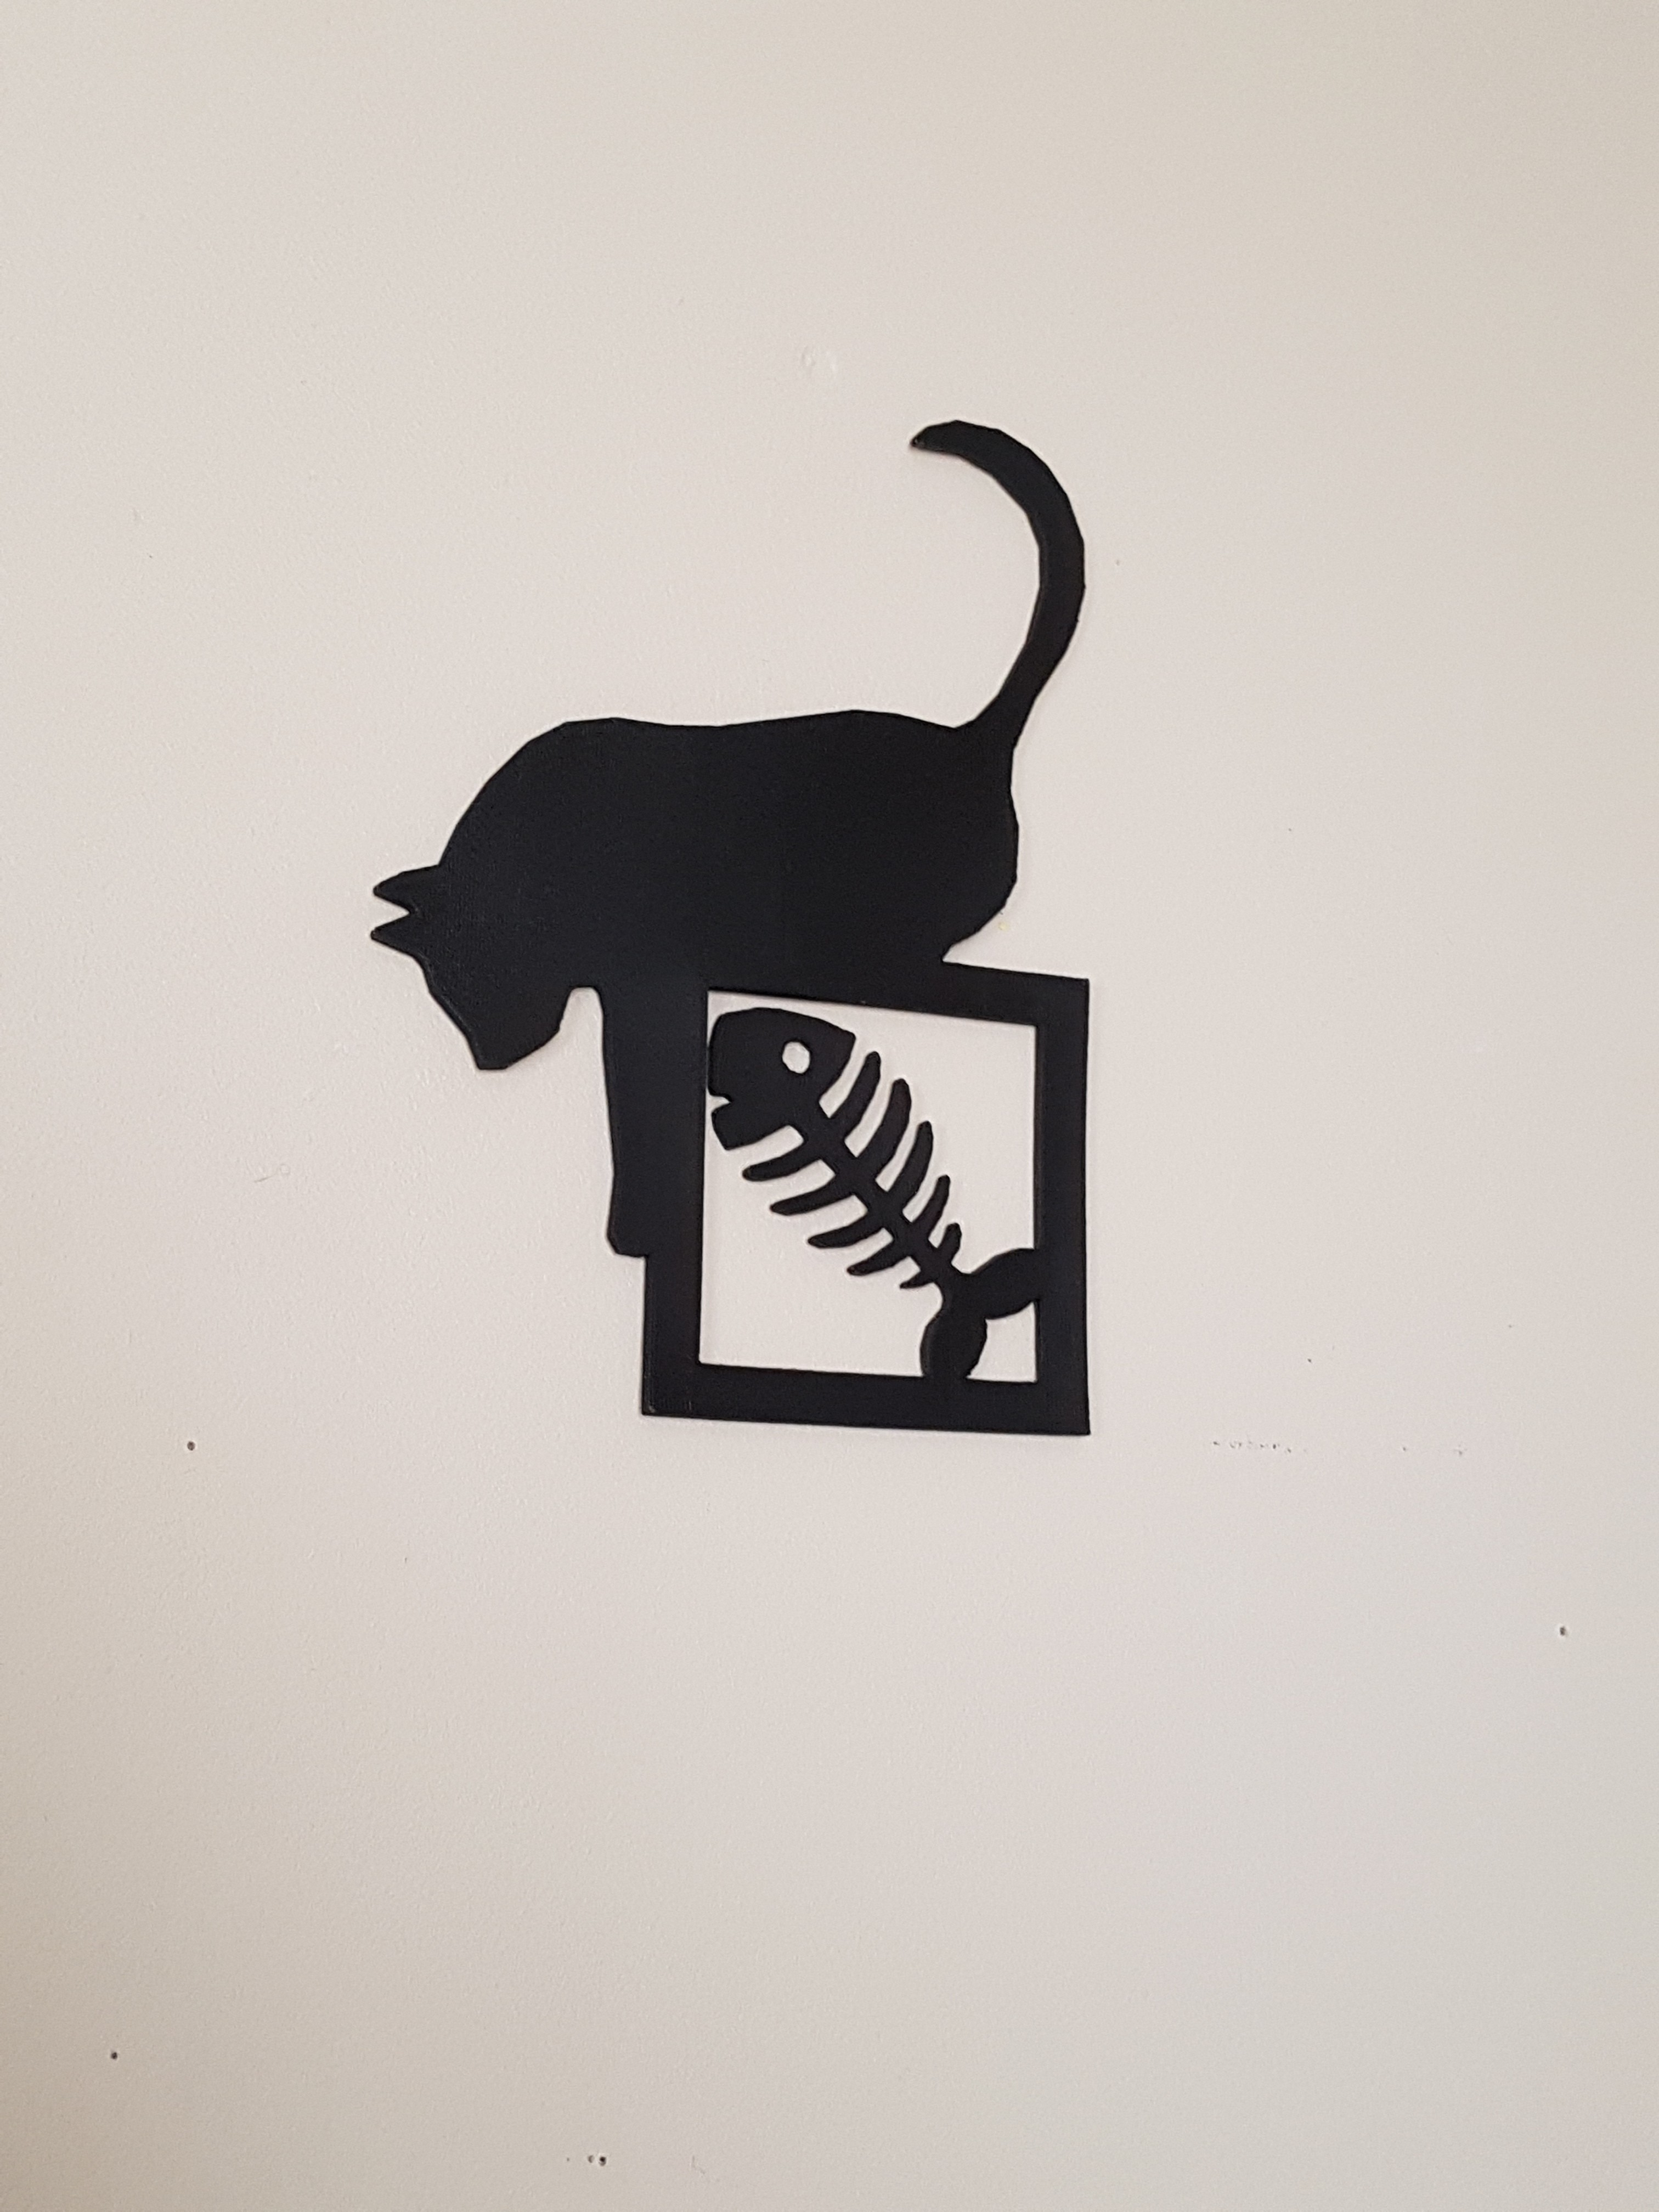 20180702_102840.jpg Download STL file cat pictures • 3D printable model, catf3d